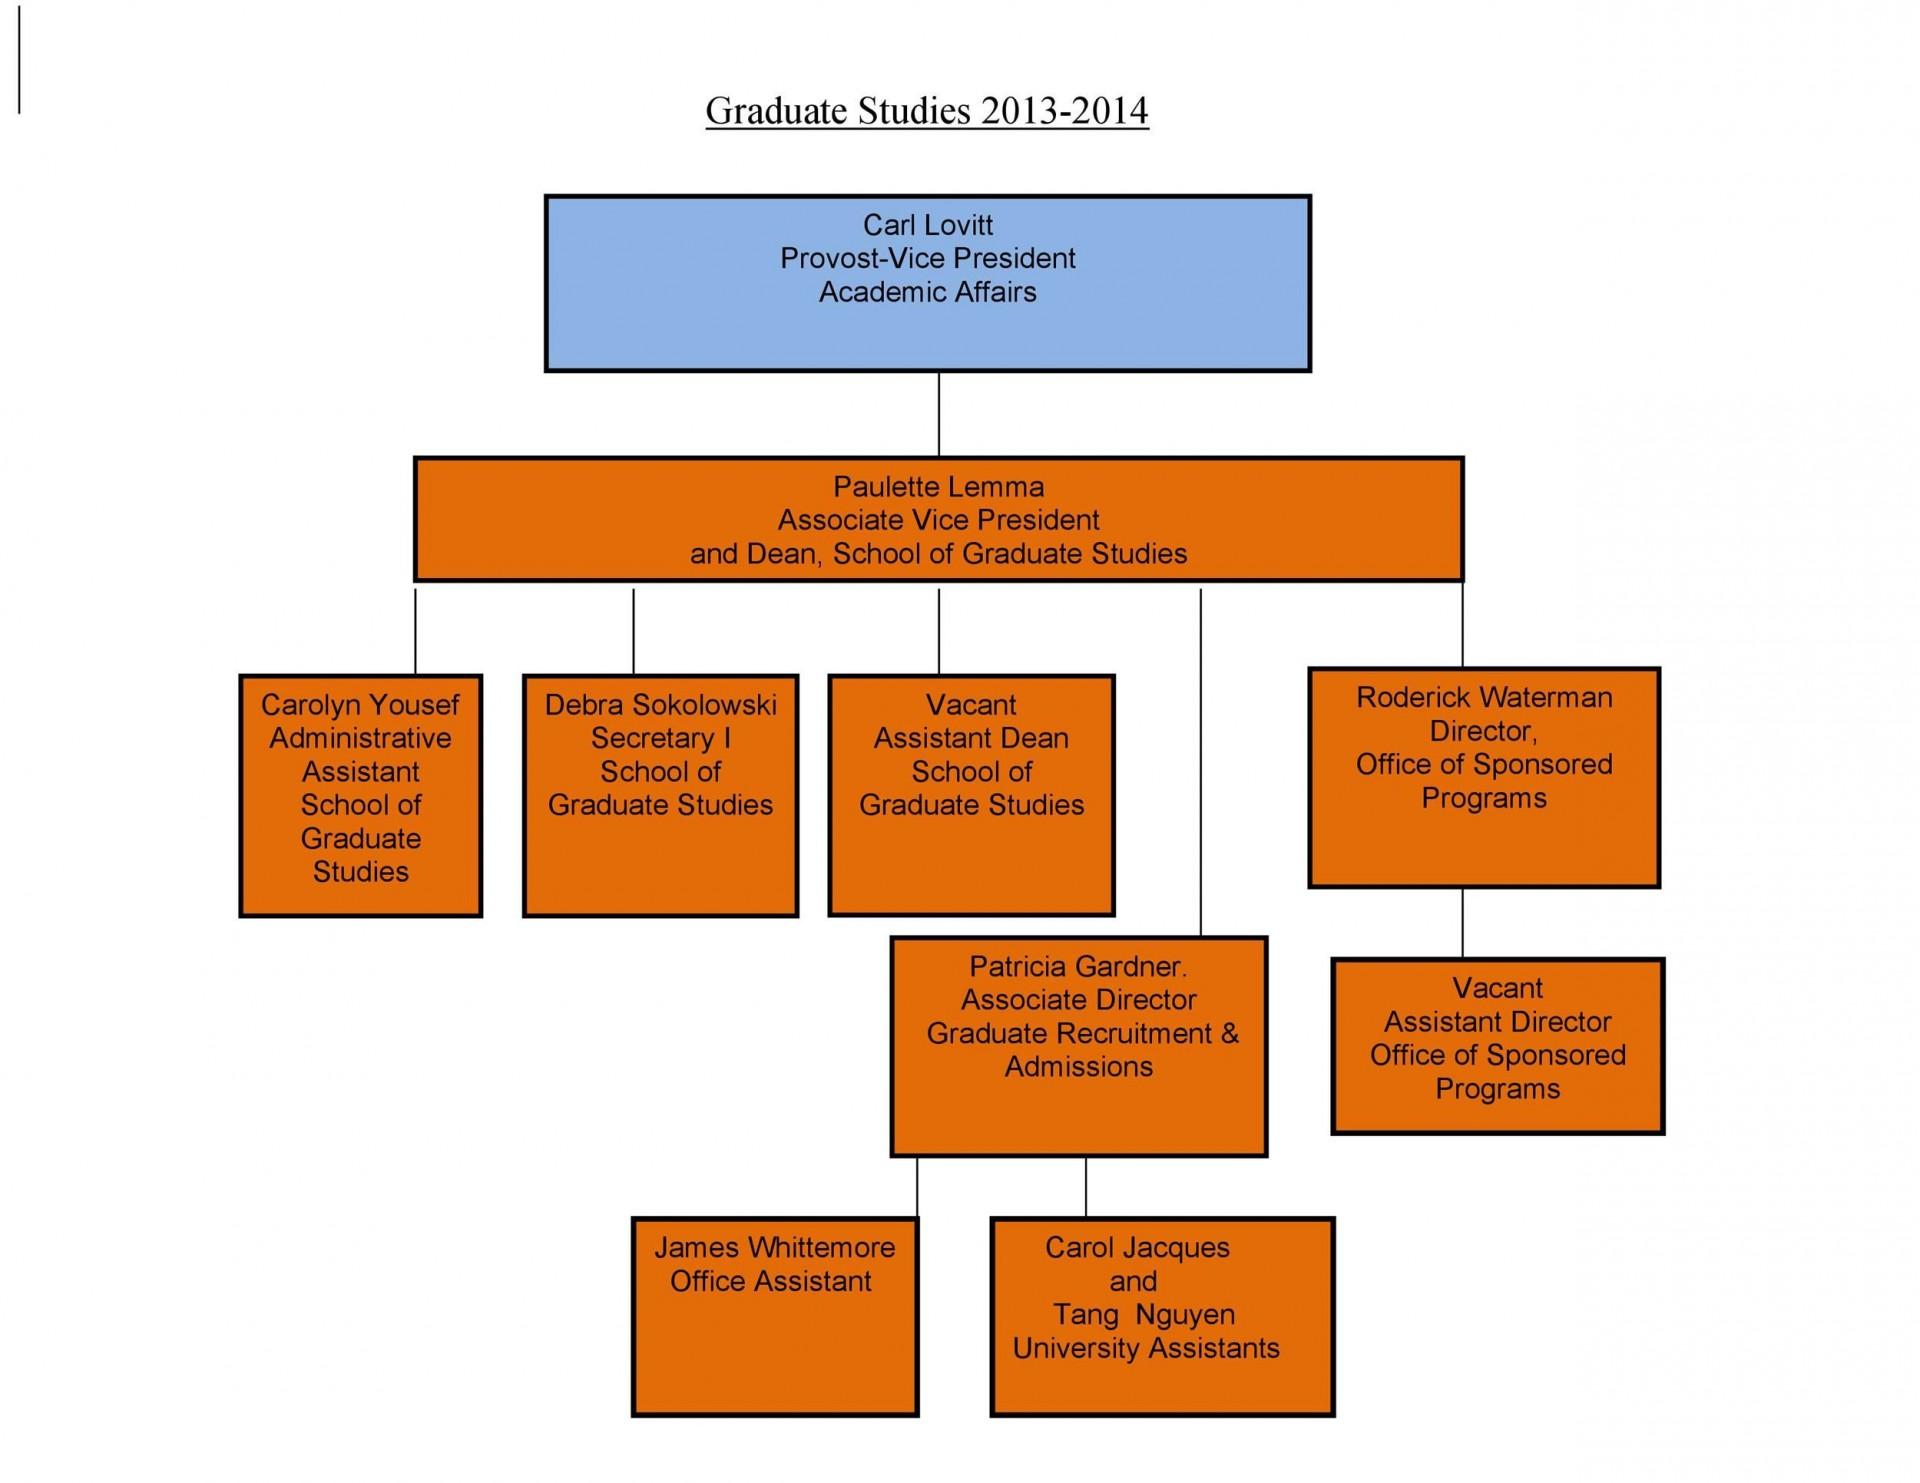 006 Sensational Organization Chart Template Word 2013 Picture  Organizational Free Microsoft1920